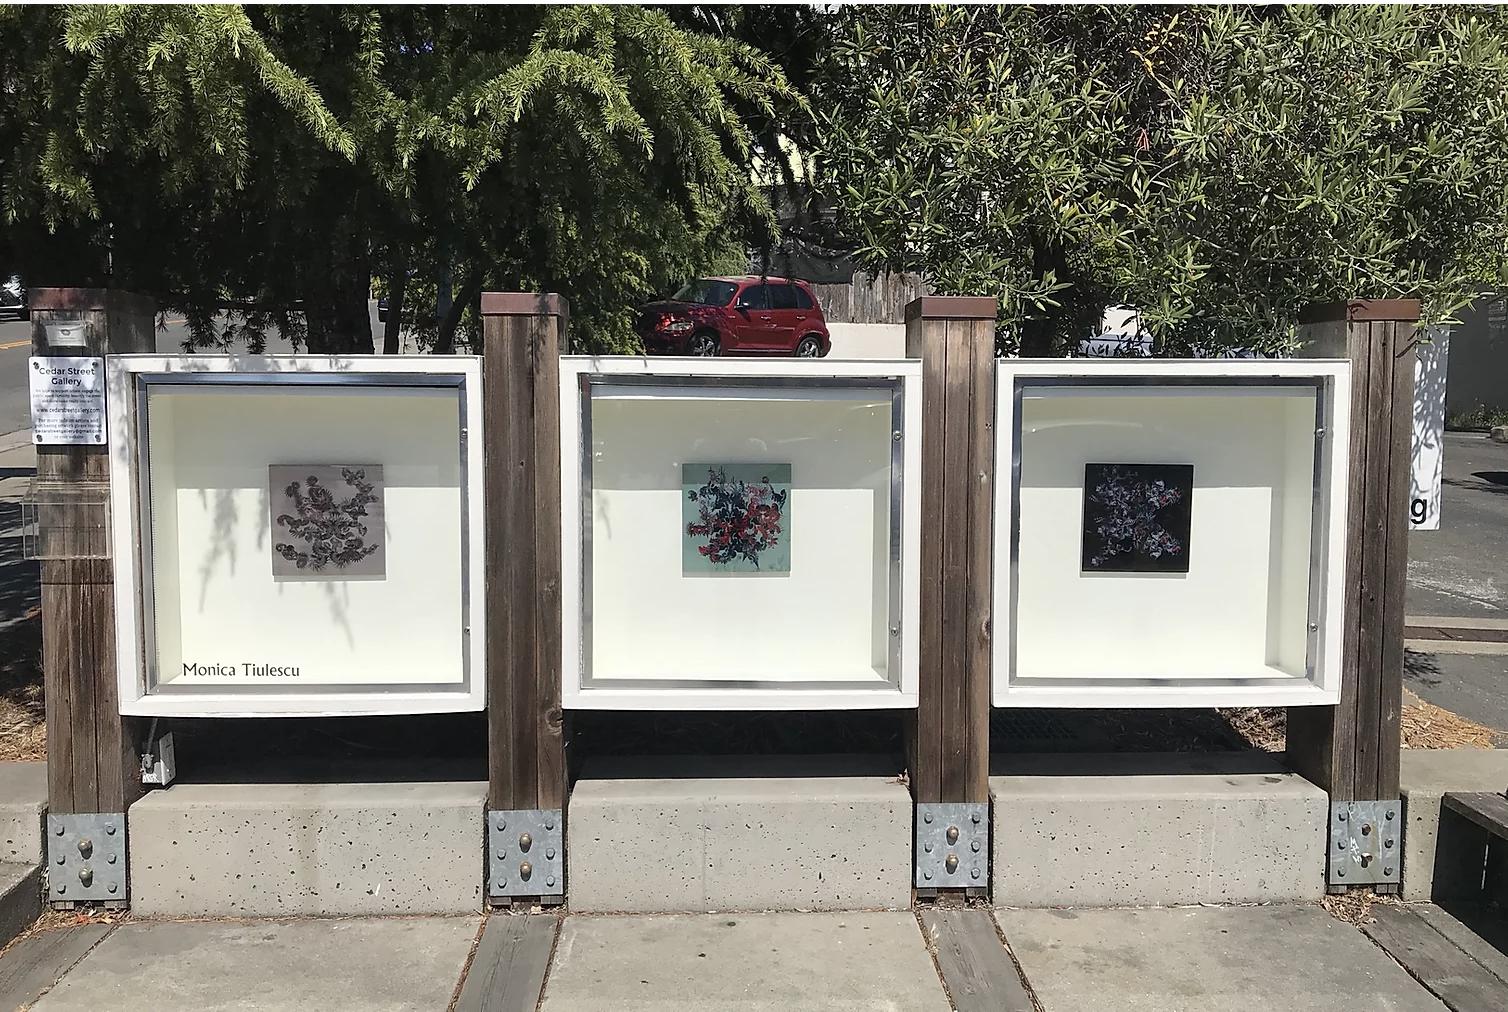 Species at Cedar street (2020)